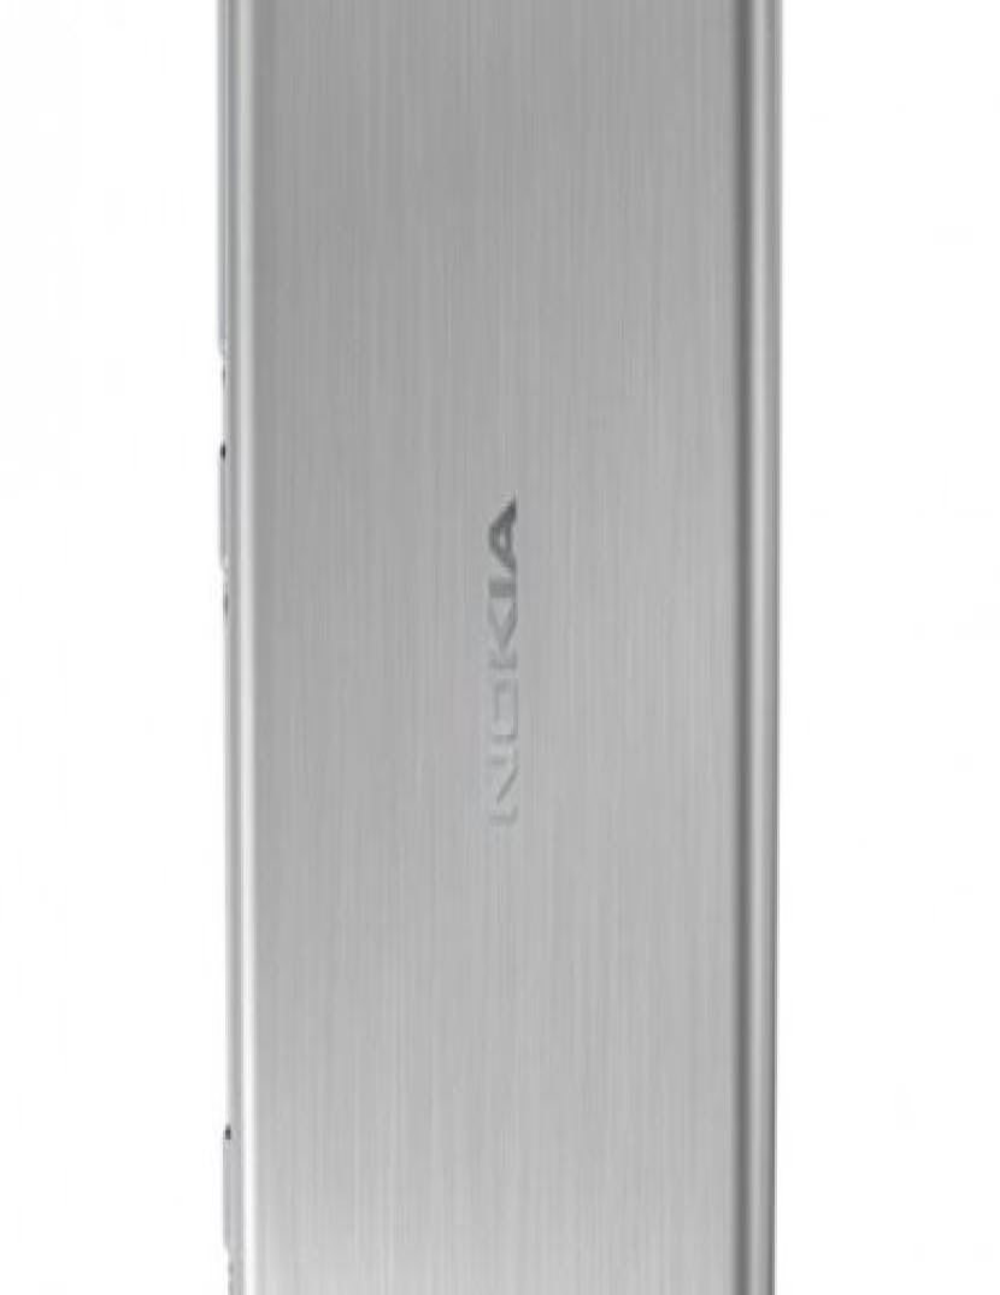 Nokia 700 Zeta: Διέρρευσαν οι πρώτες επίσημες φωτογραφίες!